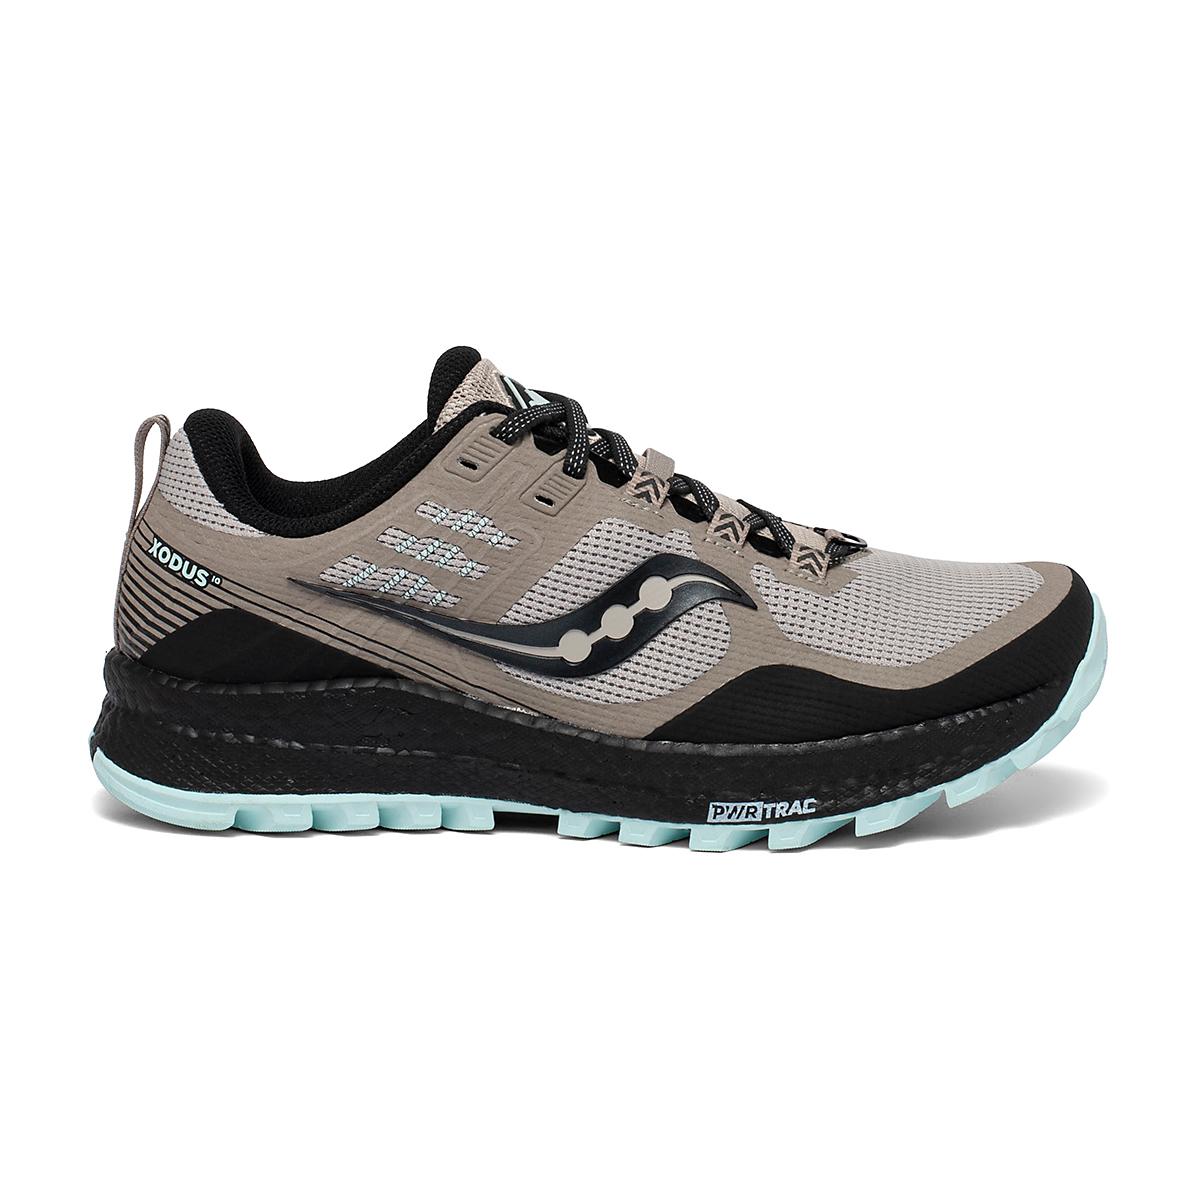 Women's Saucony Xodus 10 Trail Running Shoe - Color: Moonrock/Black - Size: 5 - Width: Regular, Moonrock/Black, large, image 1